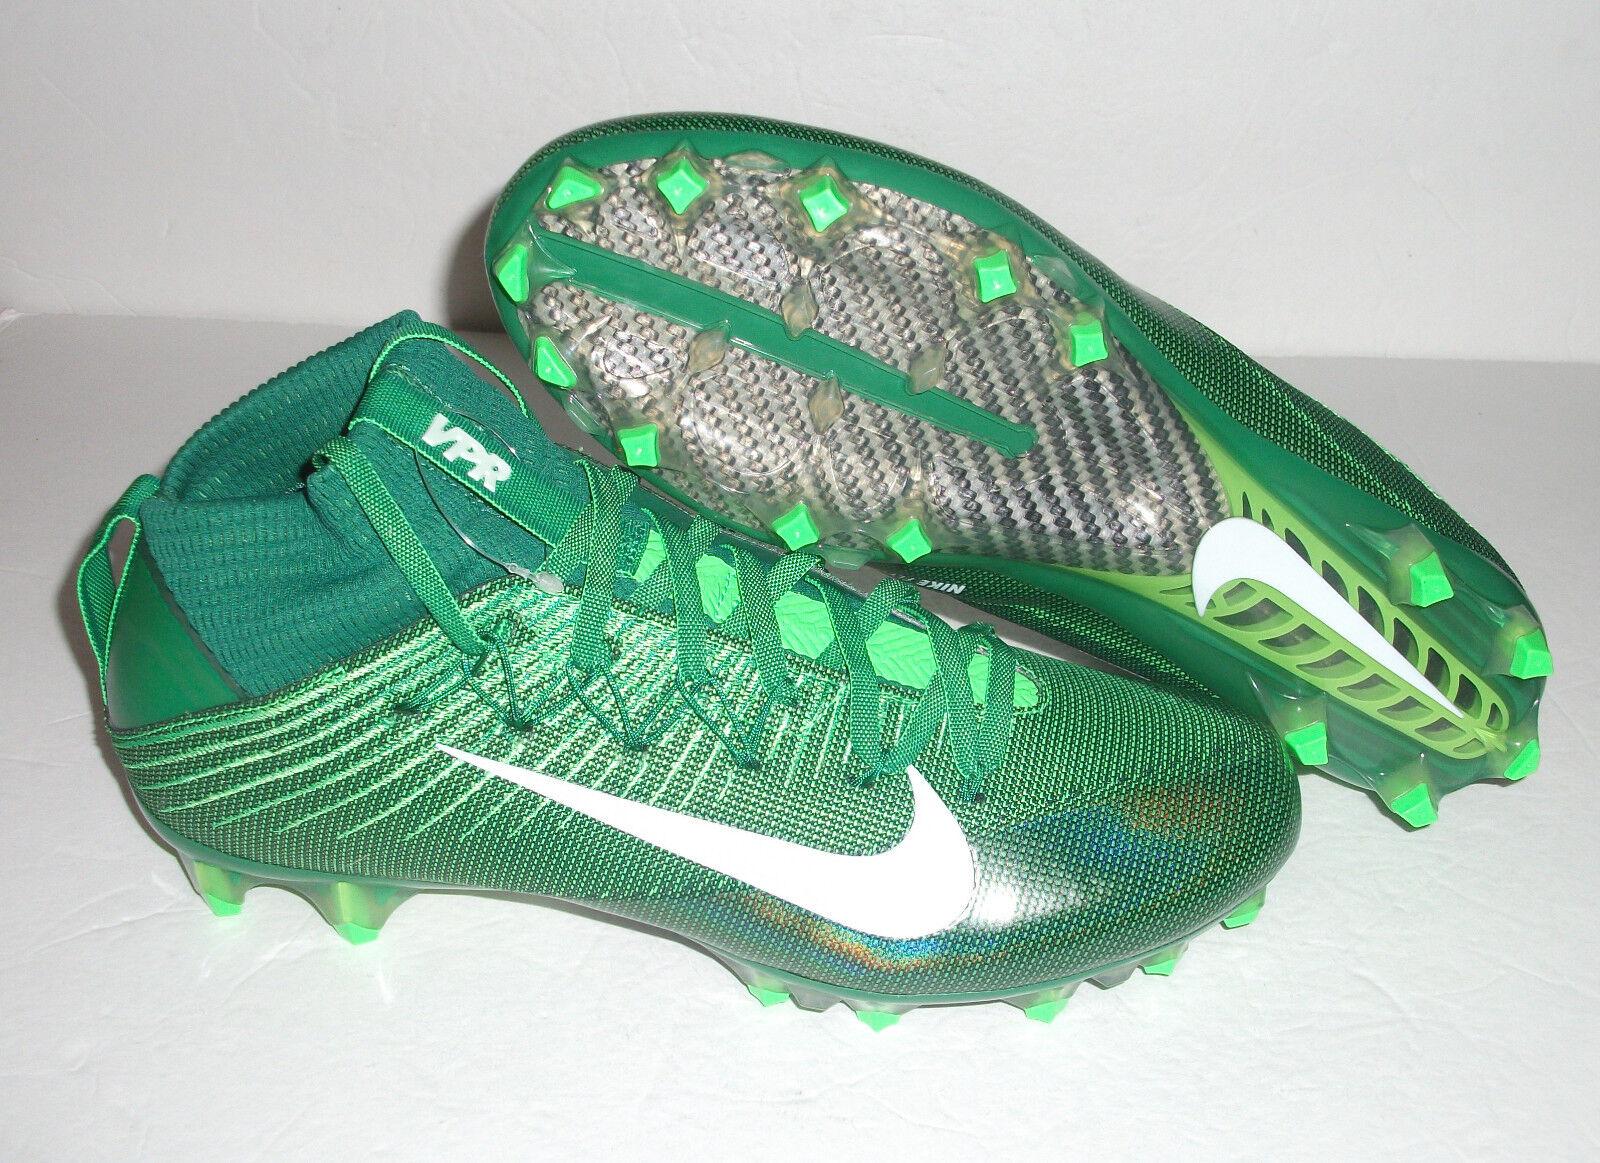 Nike Vapor Untouchable 2 Football Cleats, Men's Comfortable